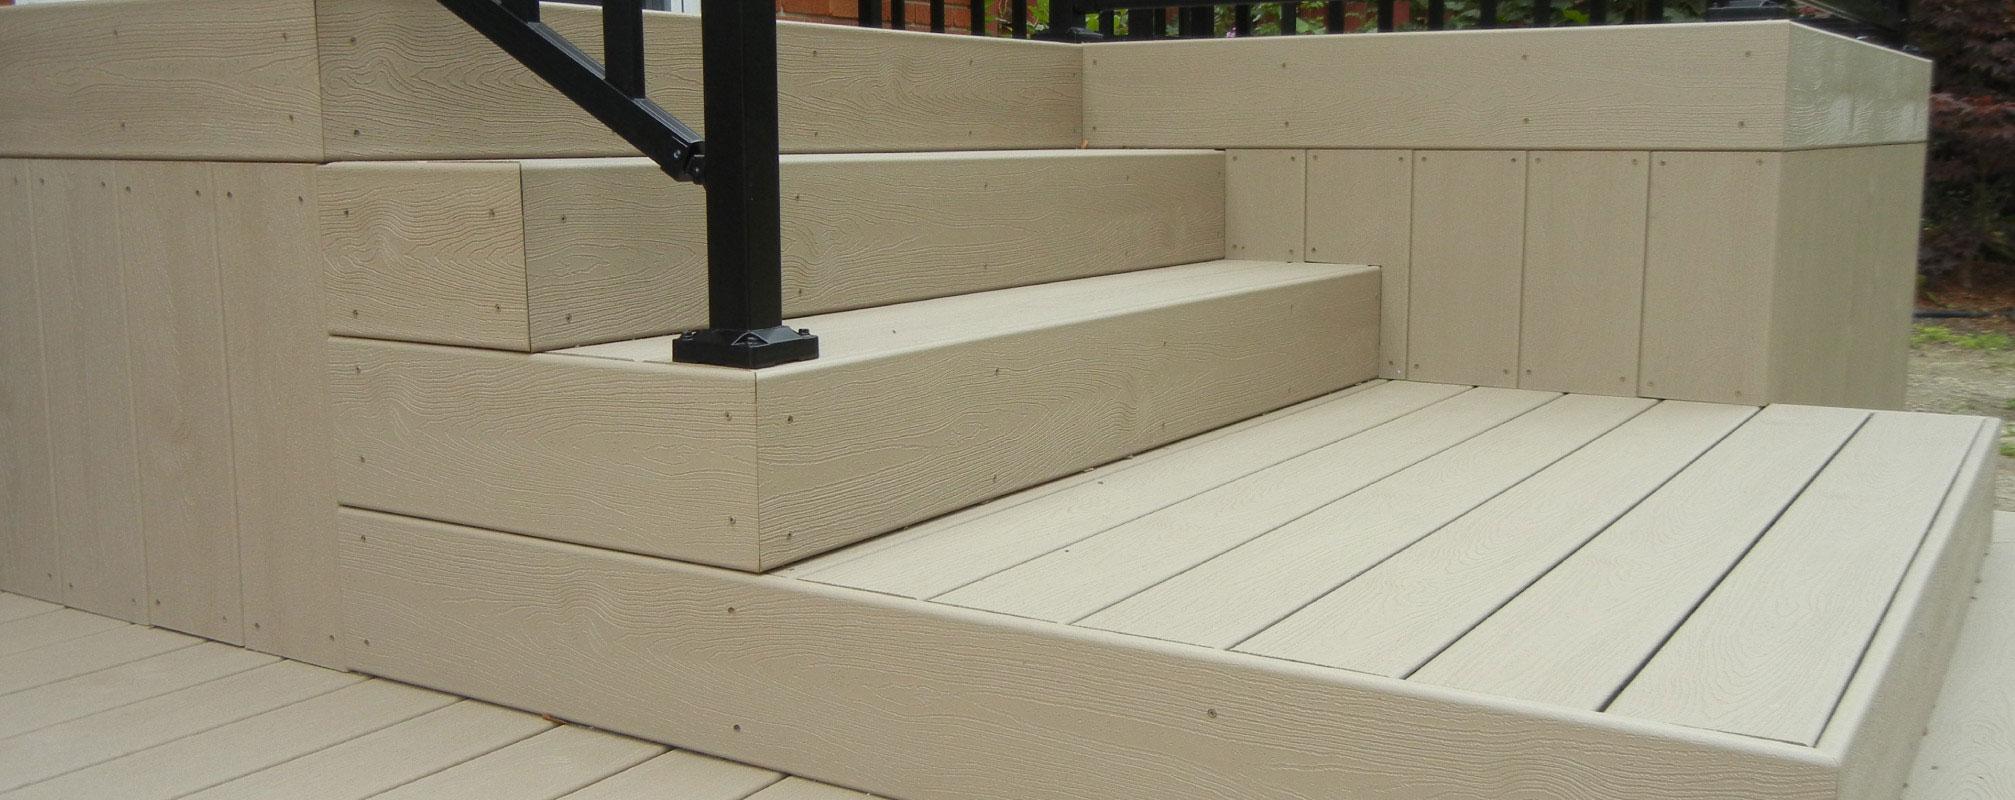 ottawa-deck-stairs